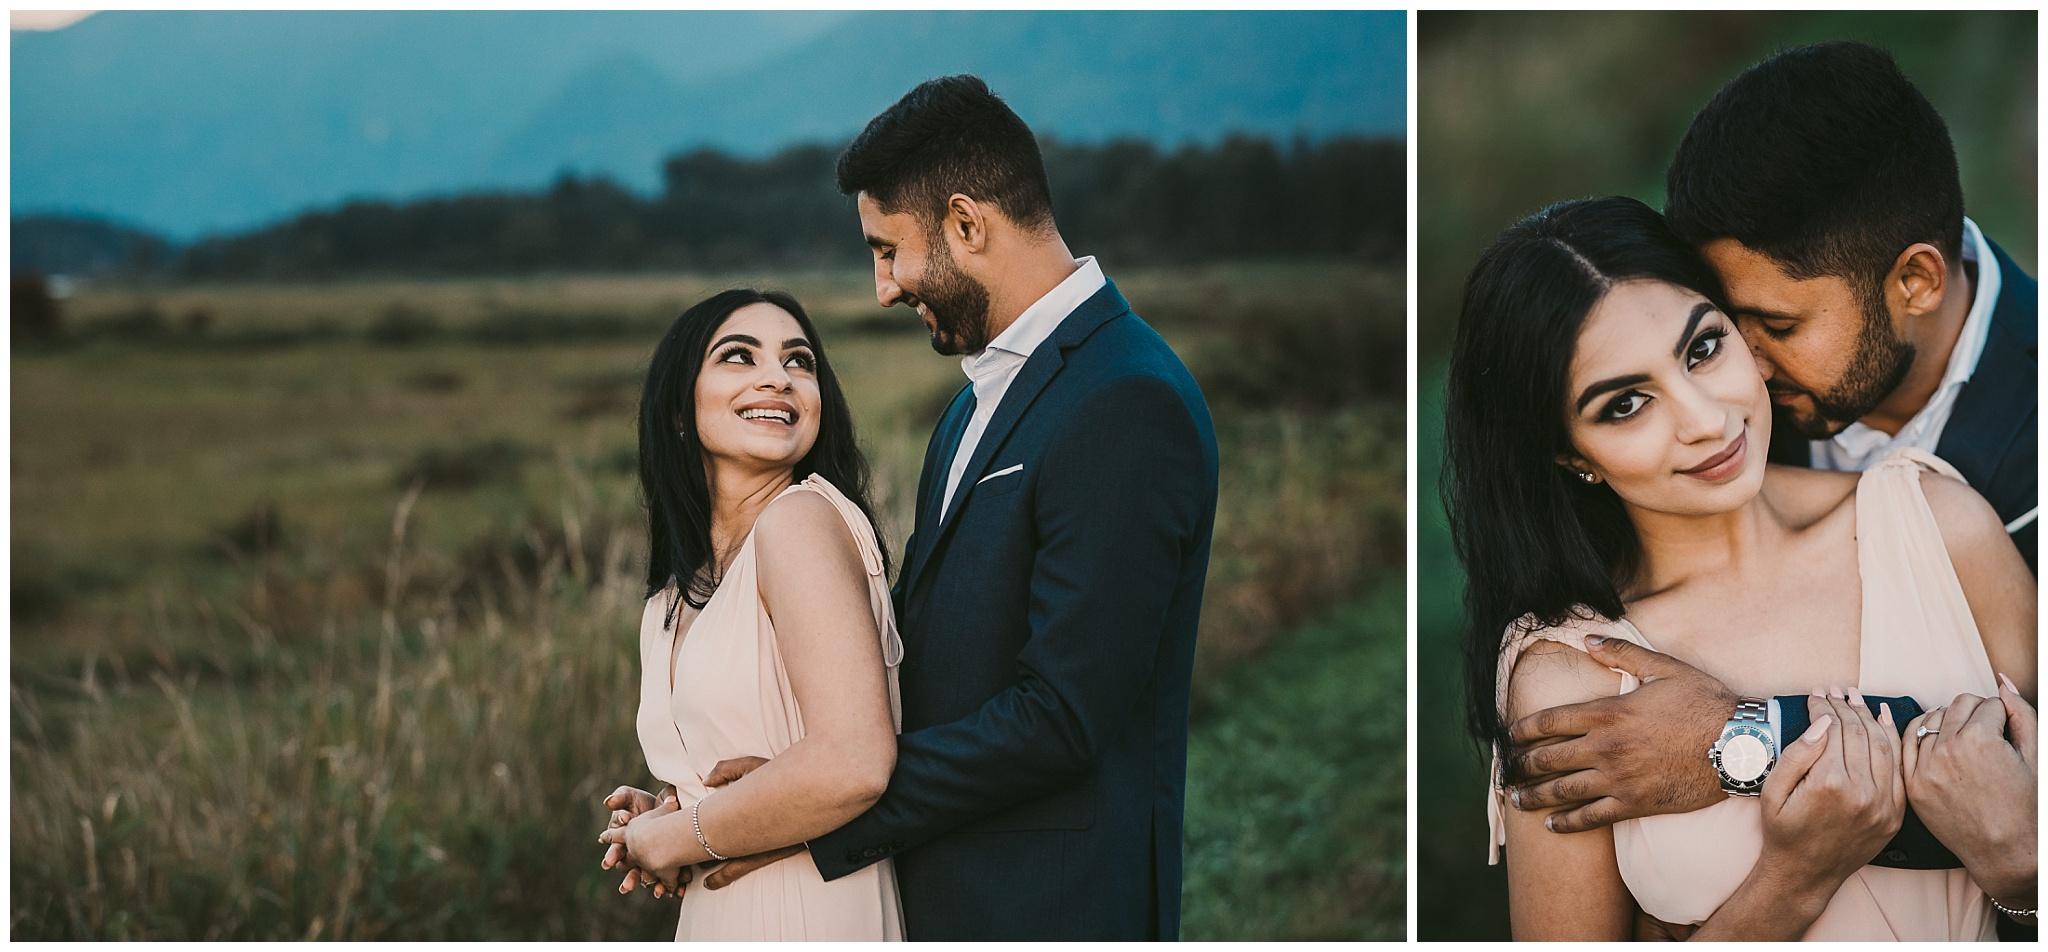 Surrey-Engagement-Photographer- 1.jpg